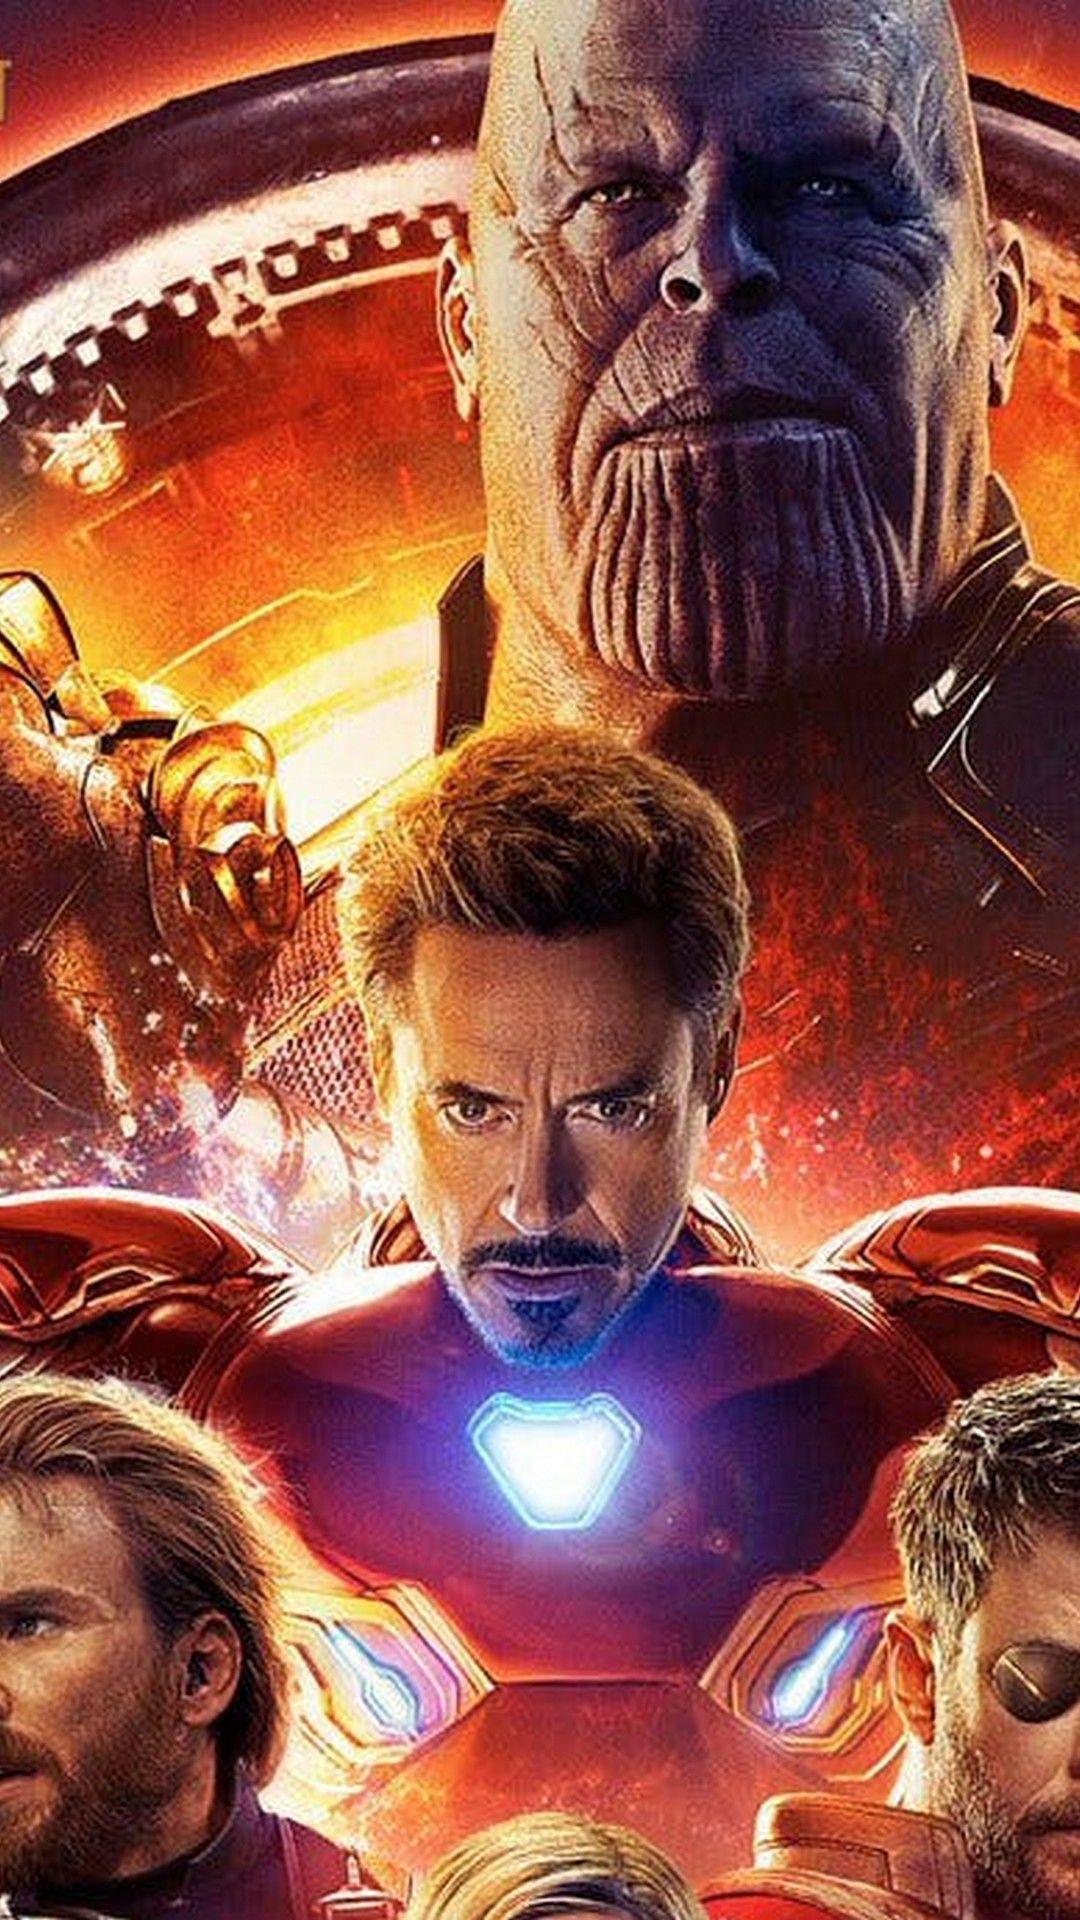 Avengers Infinity War Wallpaper For Iphone Best Iphone Wallpaper Avengers Infinity War Avengers Iphone Wallpaper